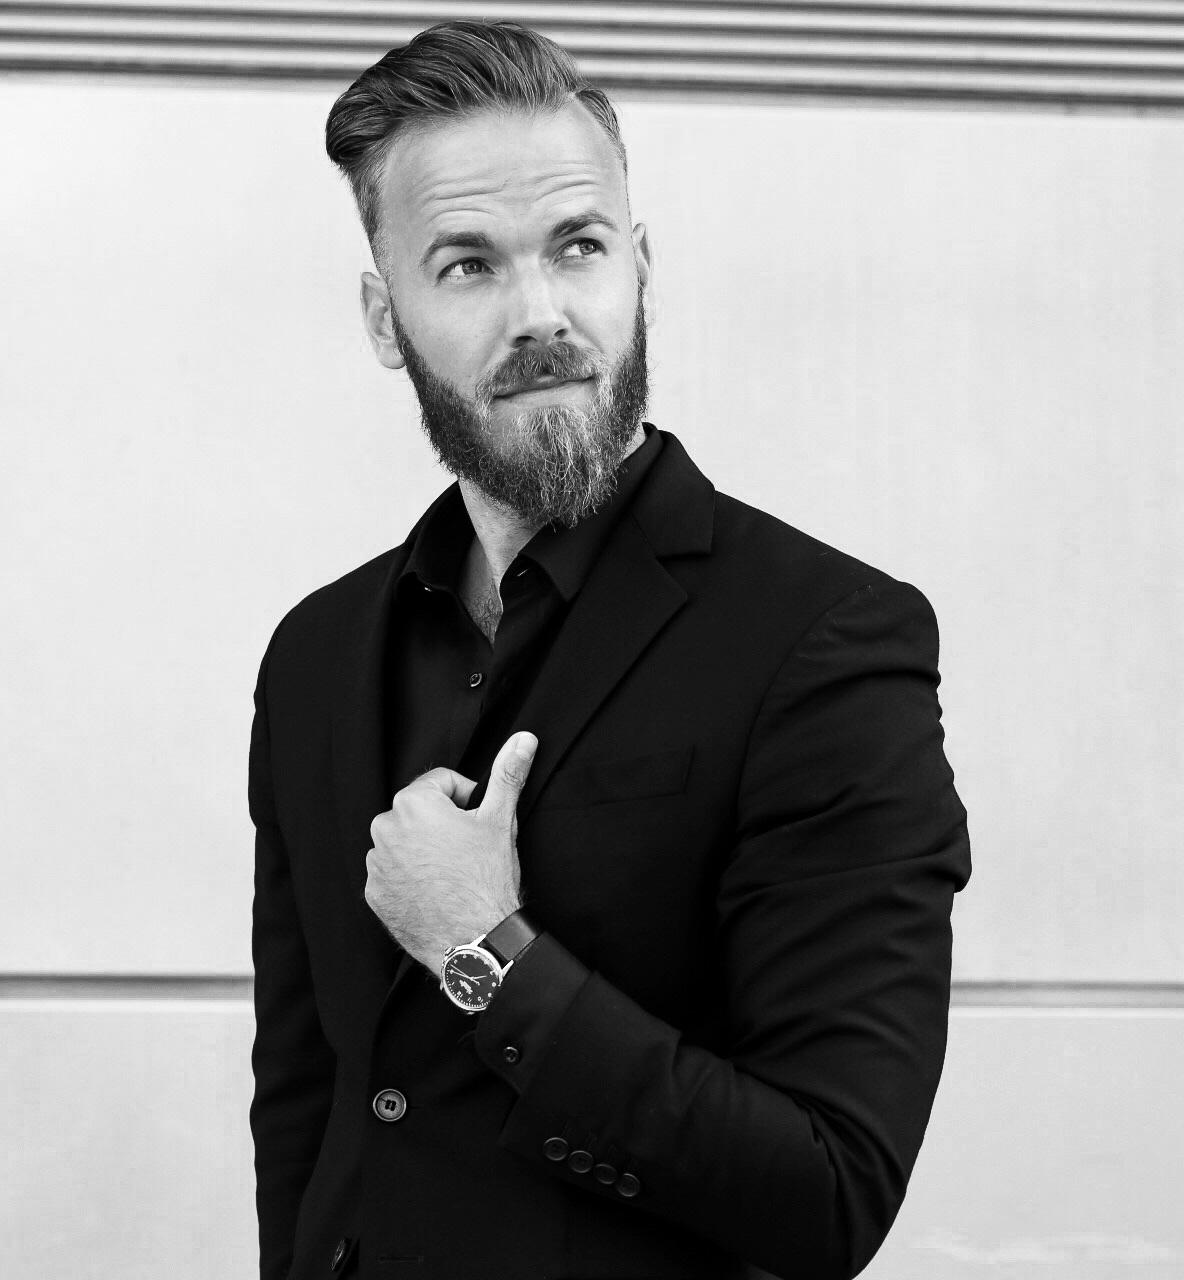 Bernd Hower Fashionblog Blogger berndhower Herren blog mode für männer